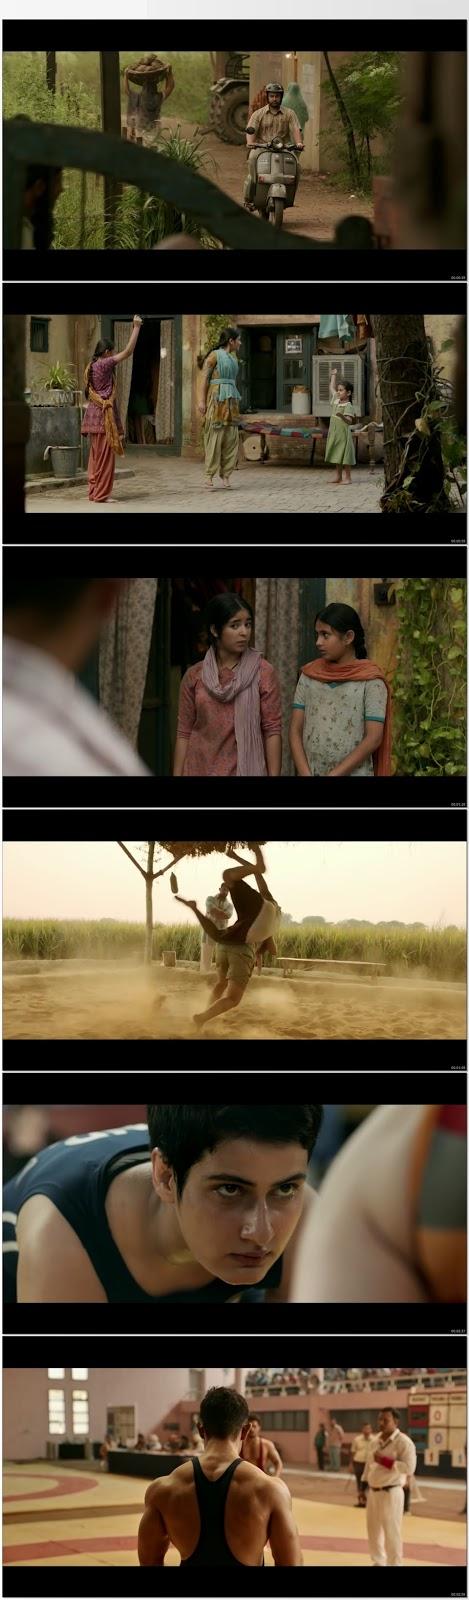 Dangal 2016 New Full Hd Hindi Movie Ft Amir Khan Free Download